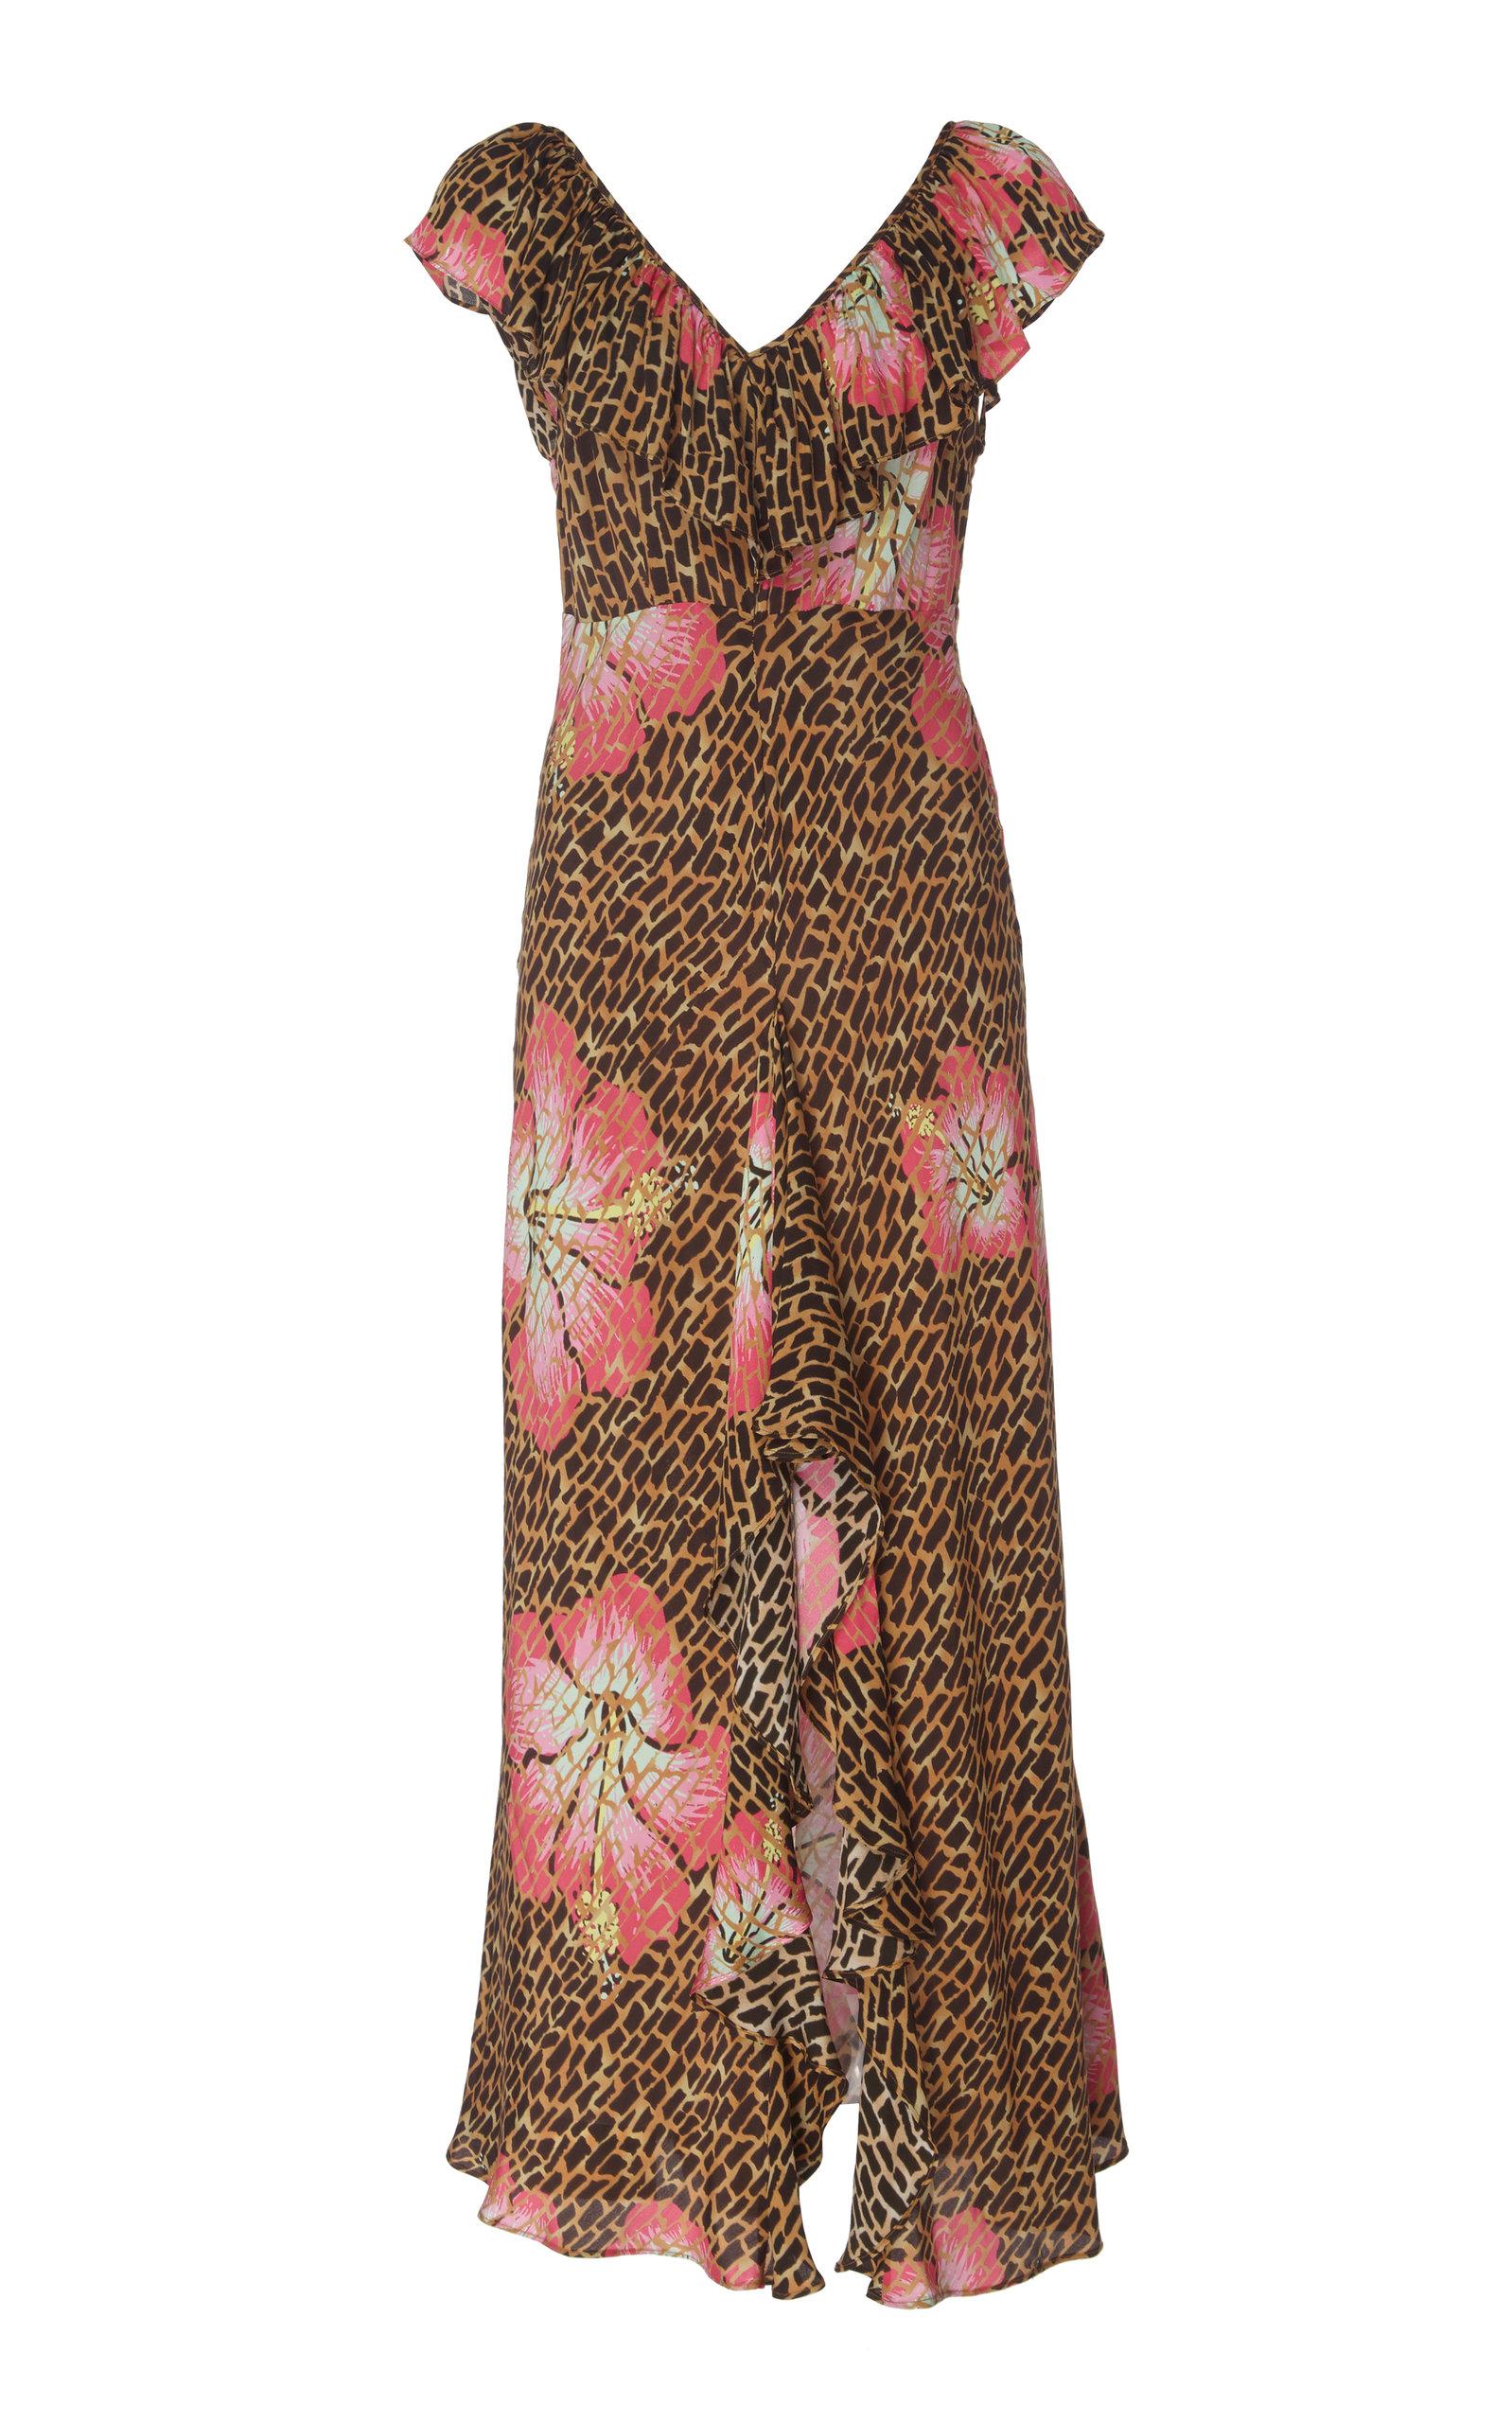 Antoinette Ruffled Silk Midi Dress by Rixo